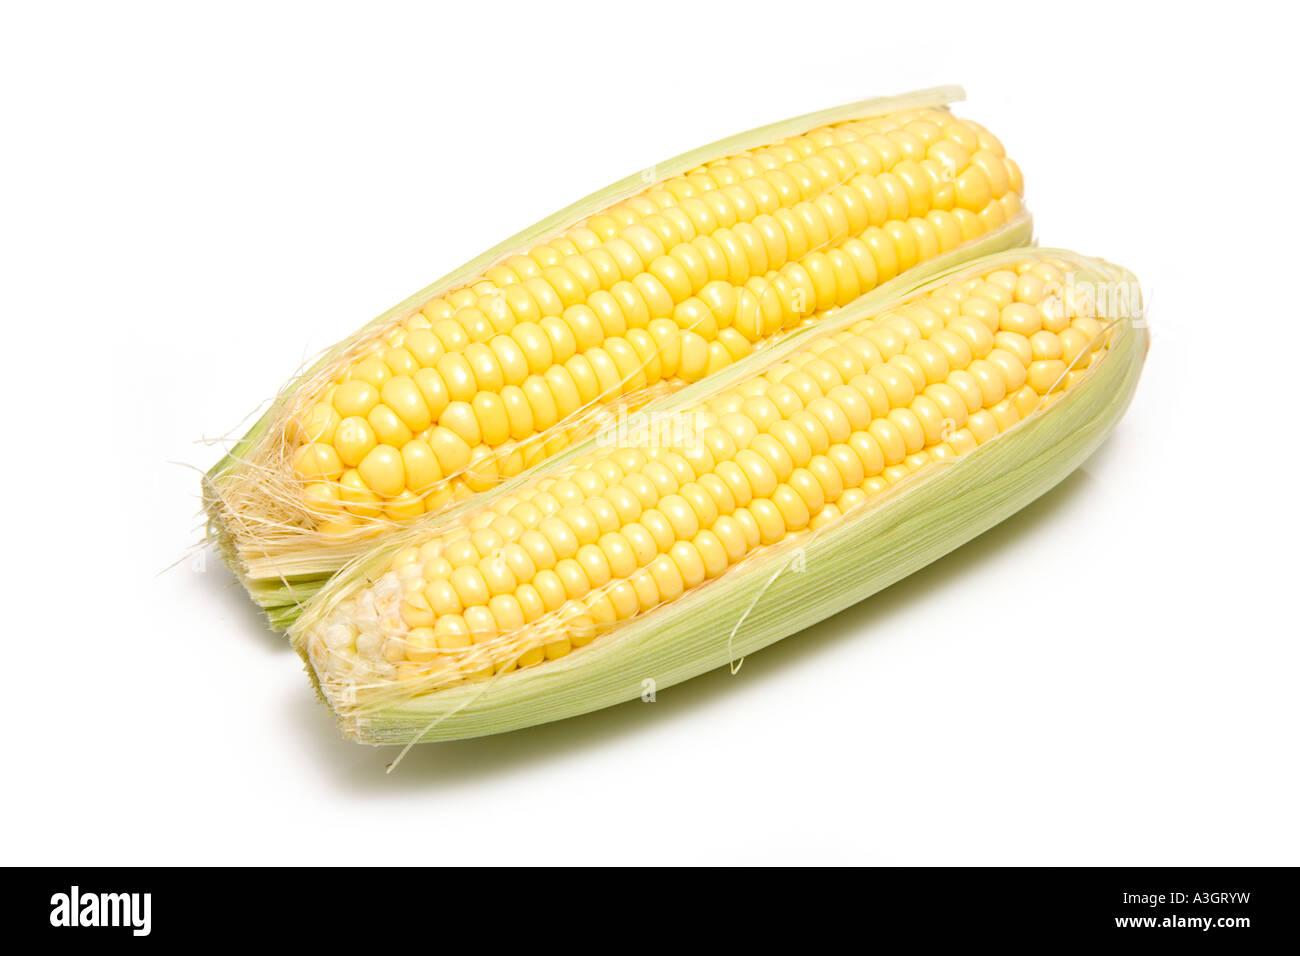 Le maïs en épi isolated on a white background studio. Photo Stock